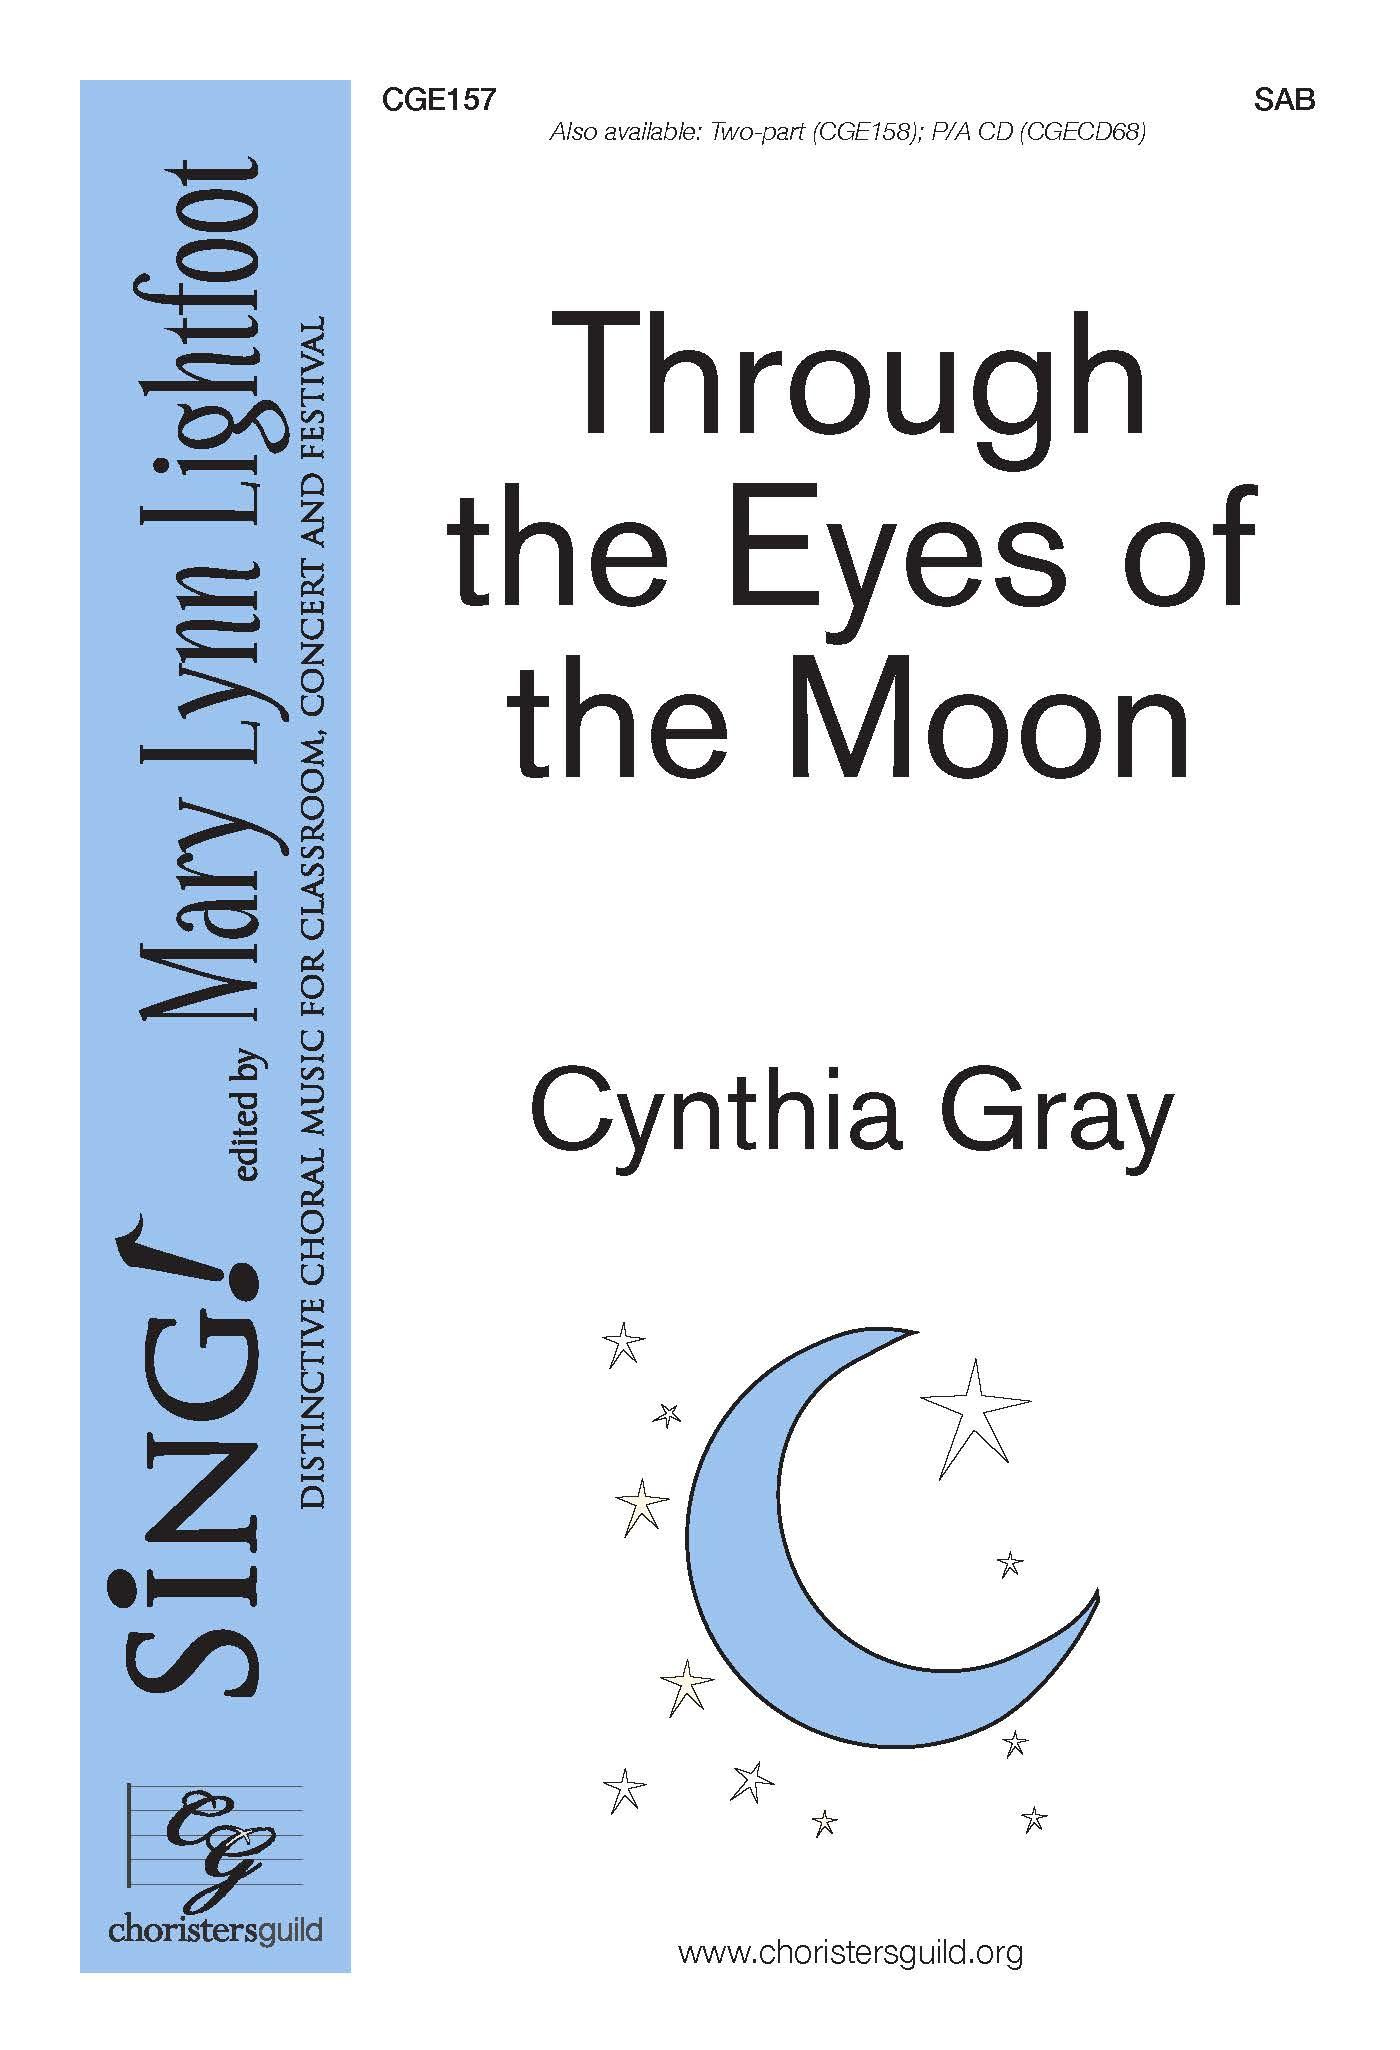 Through the Eyes of the Moon SAB